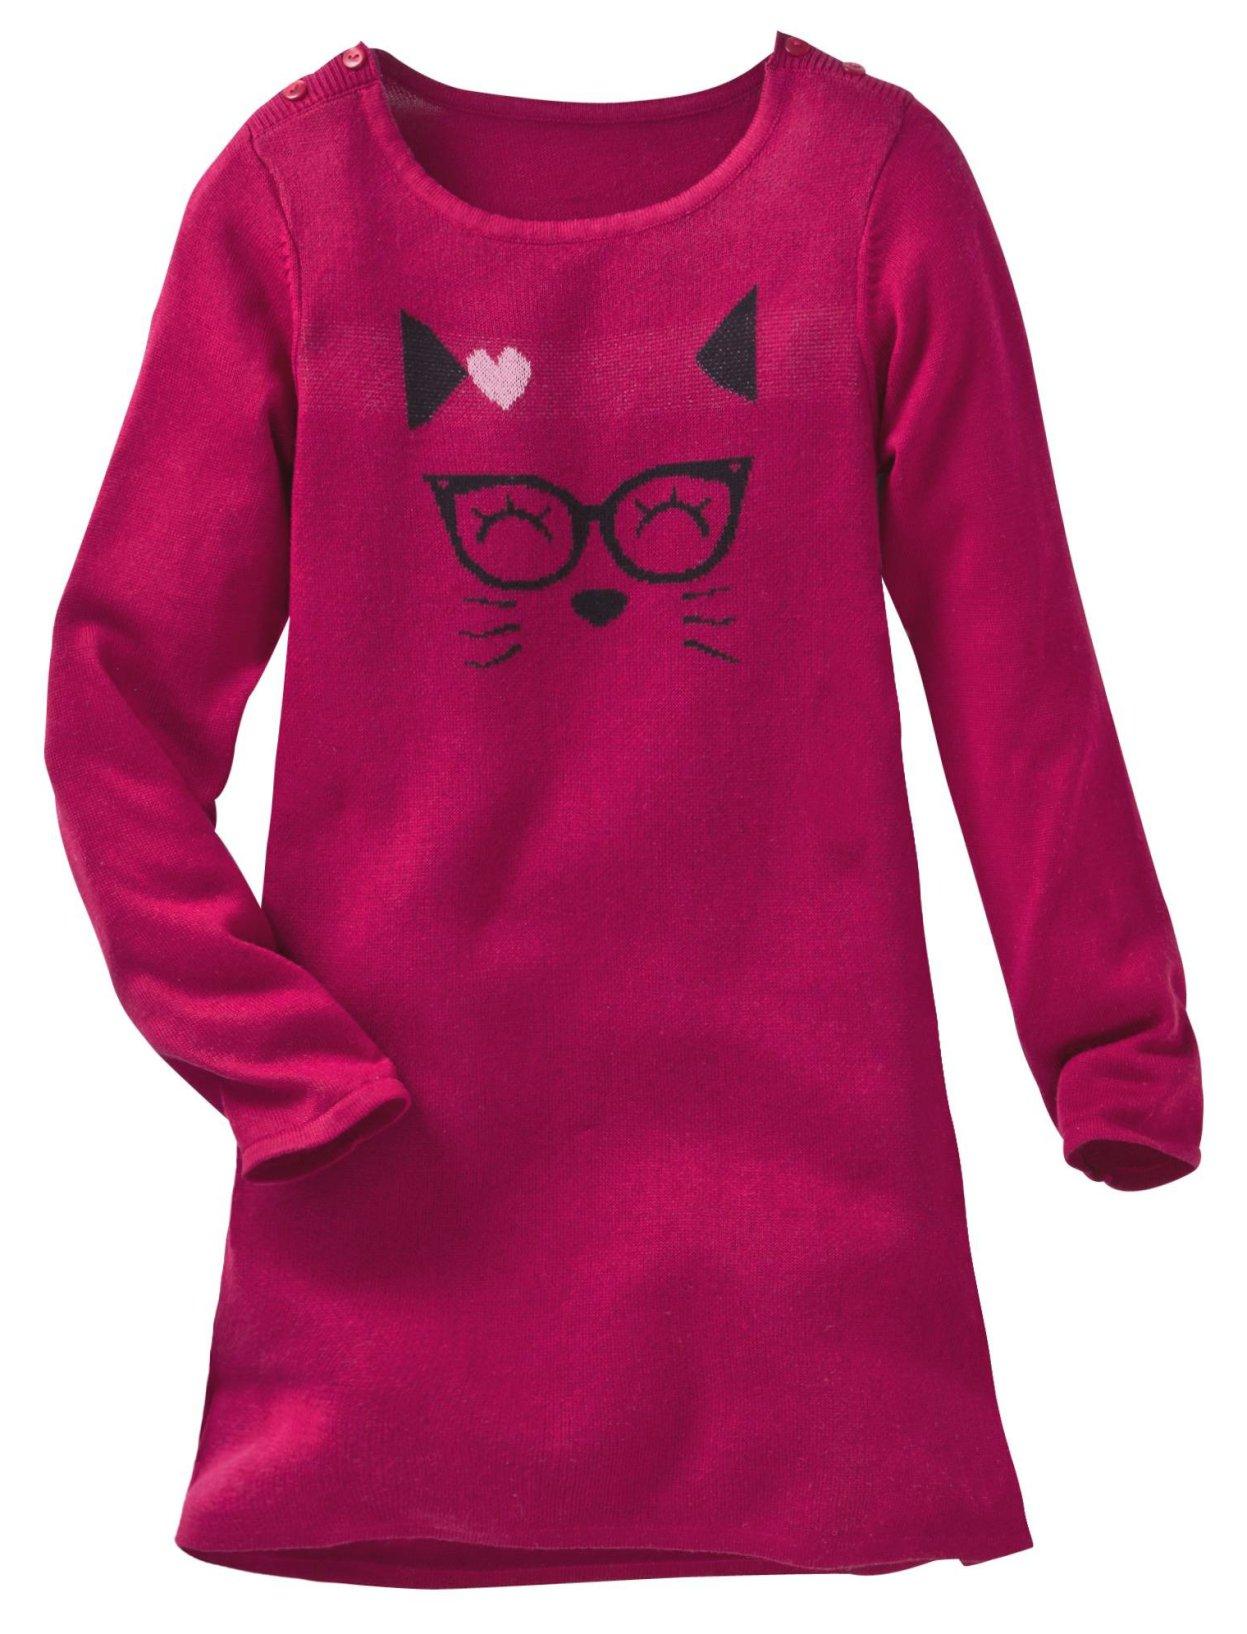 modele tricot robe 5 ans